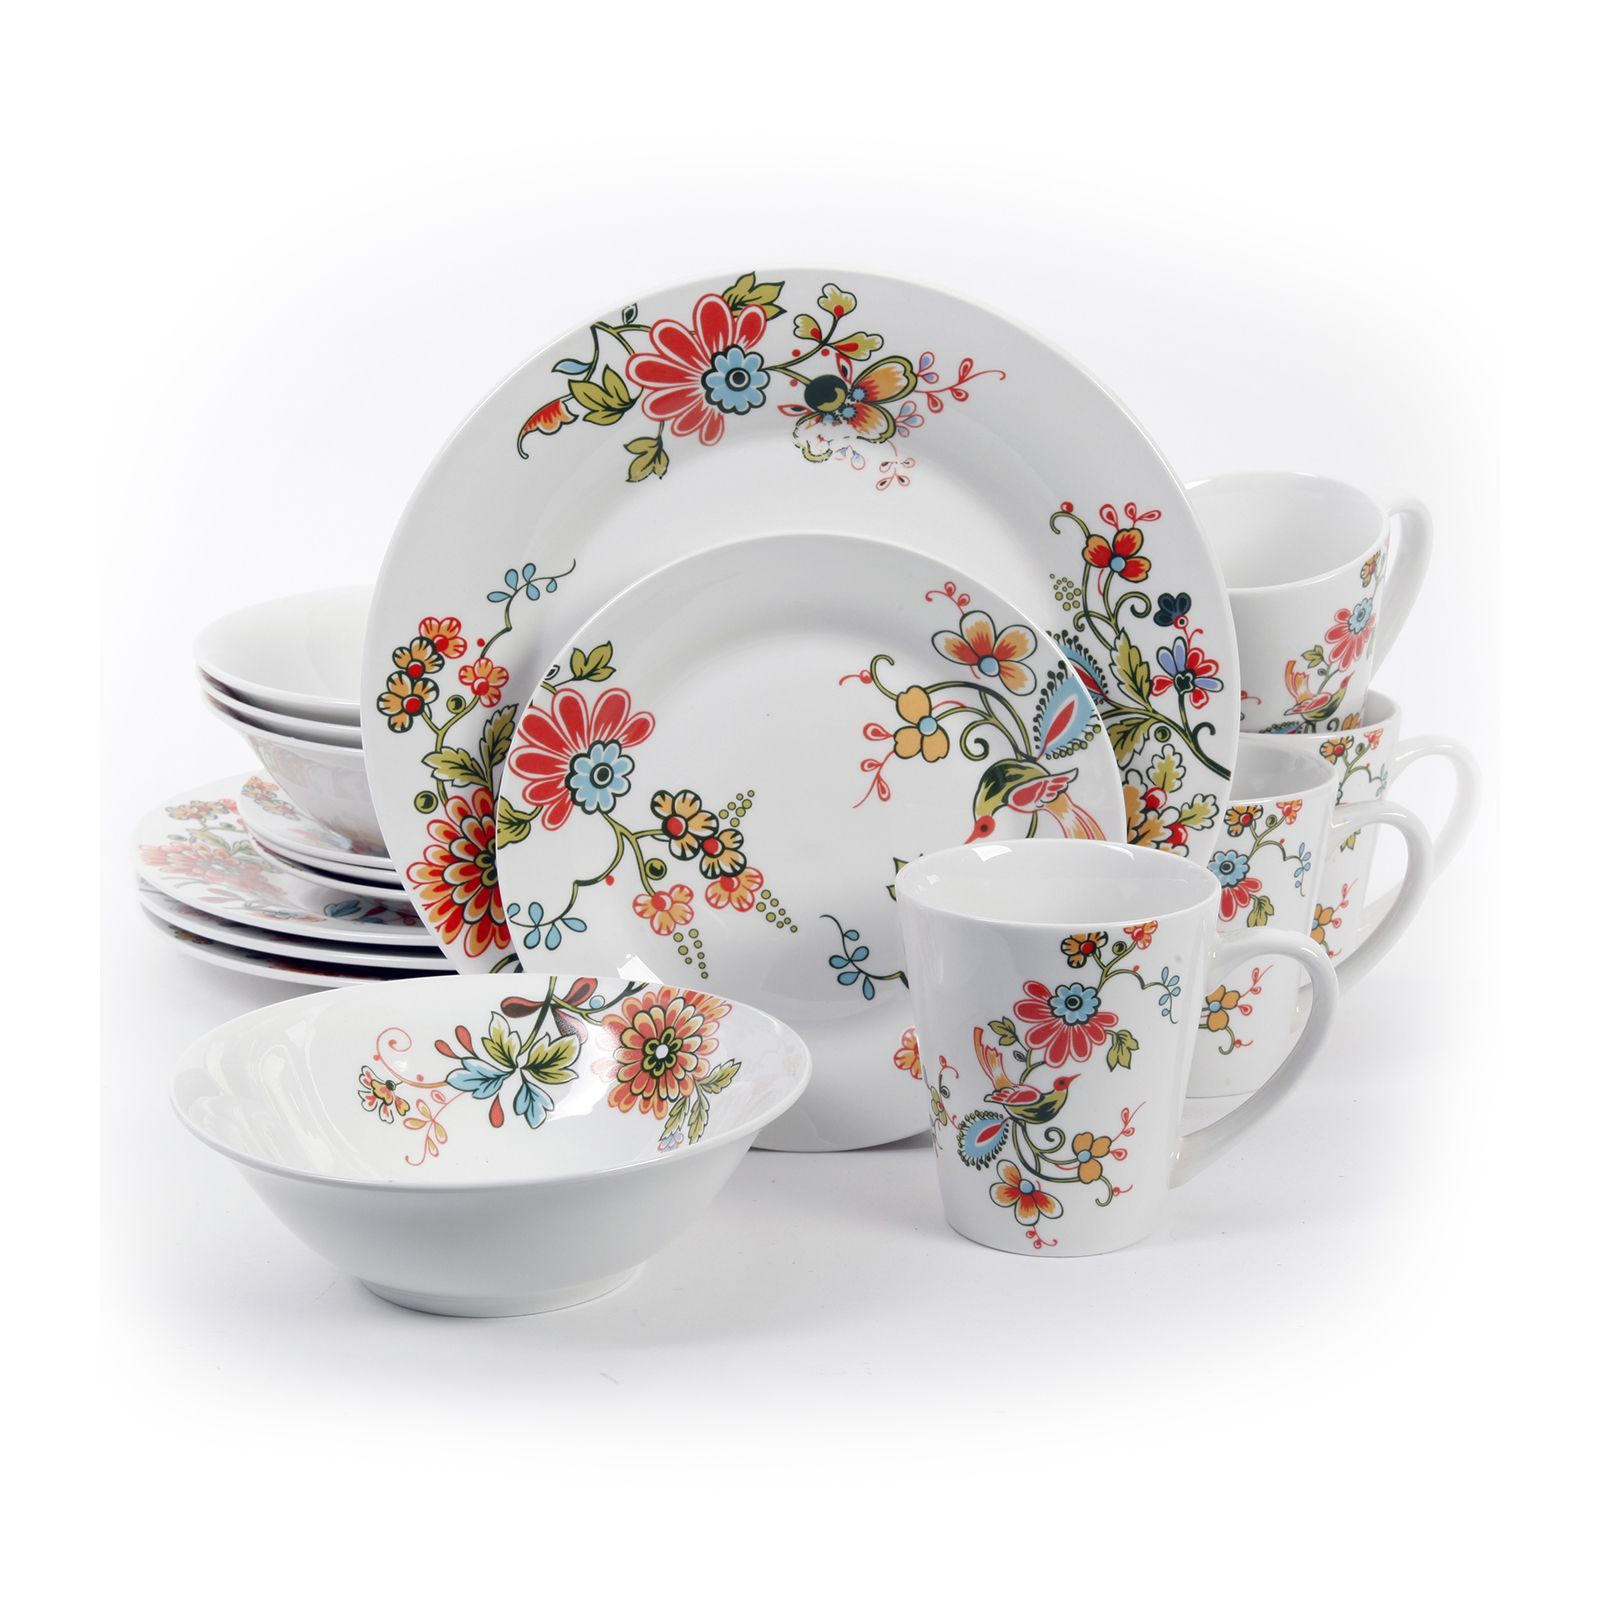 Patterned Dinnerware Sets Interesting Inspiration Design